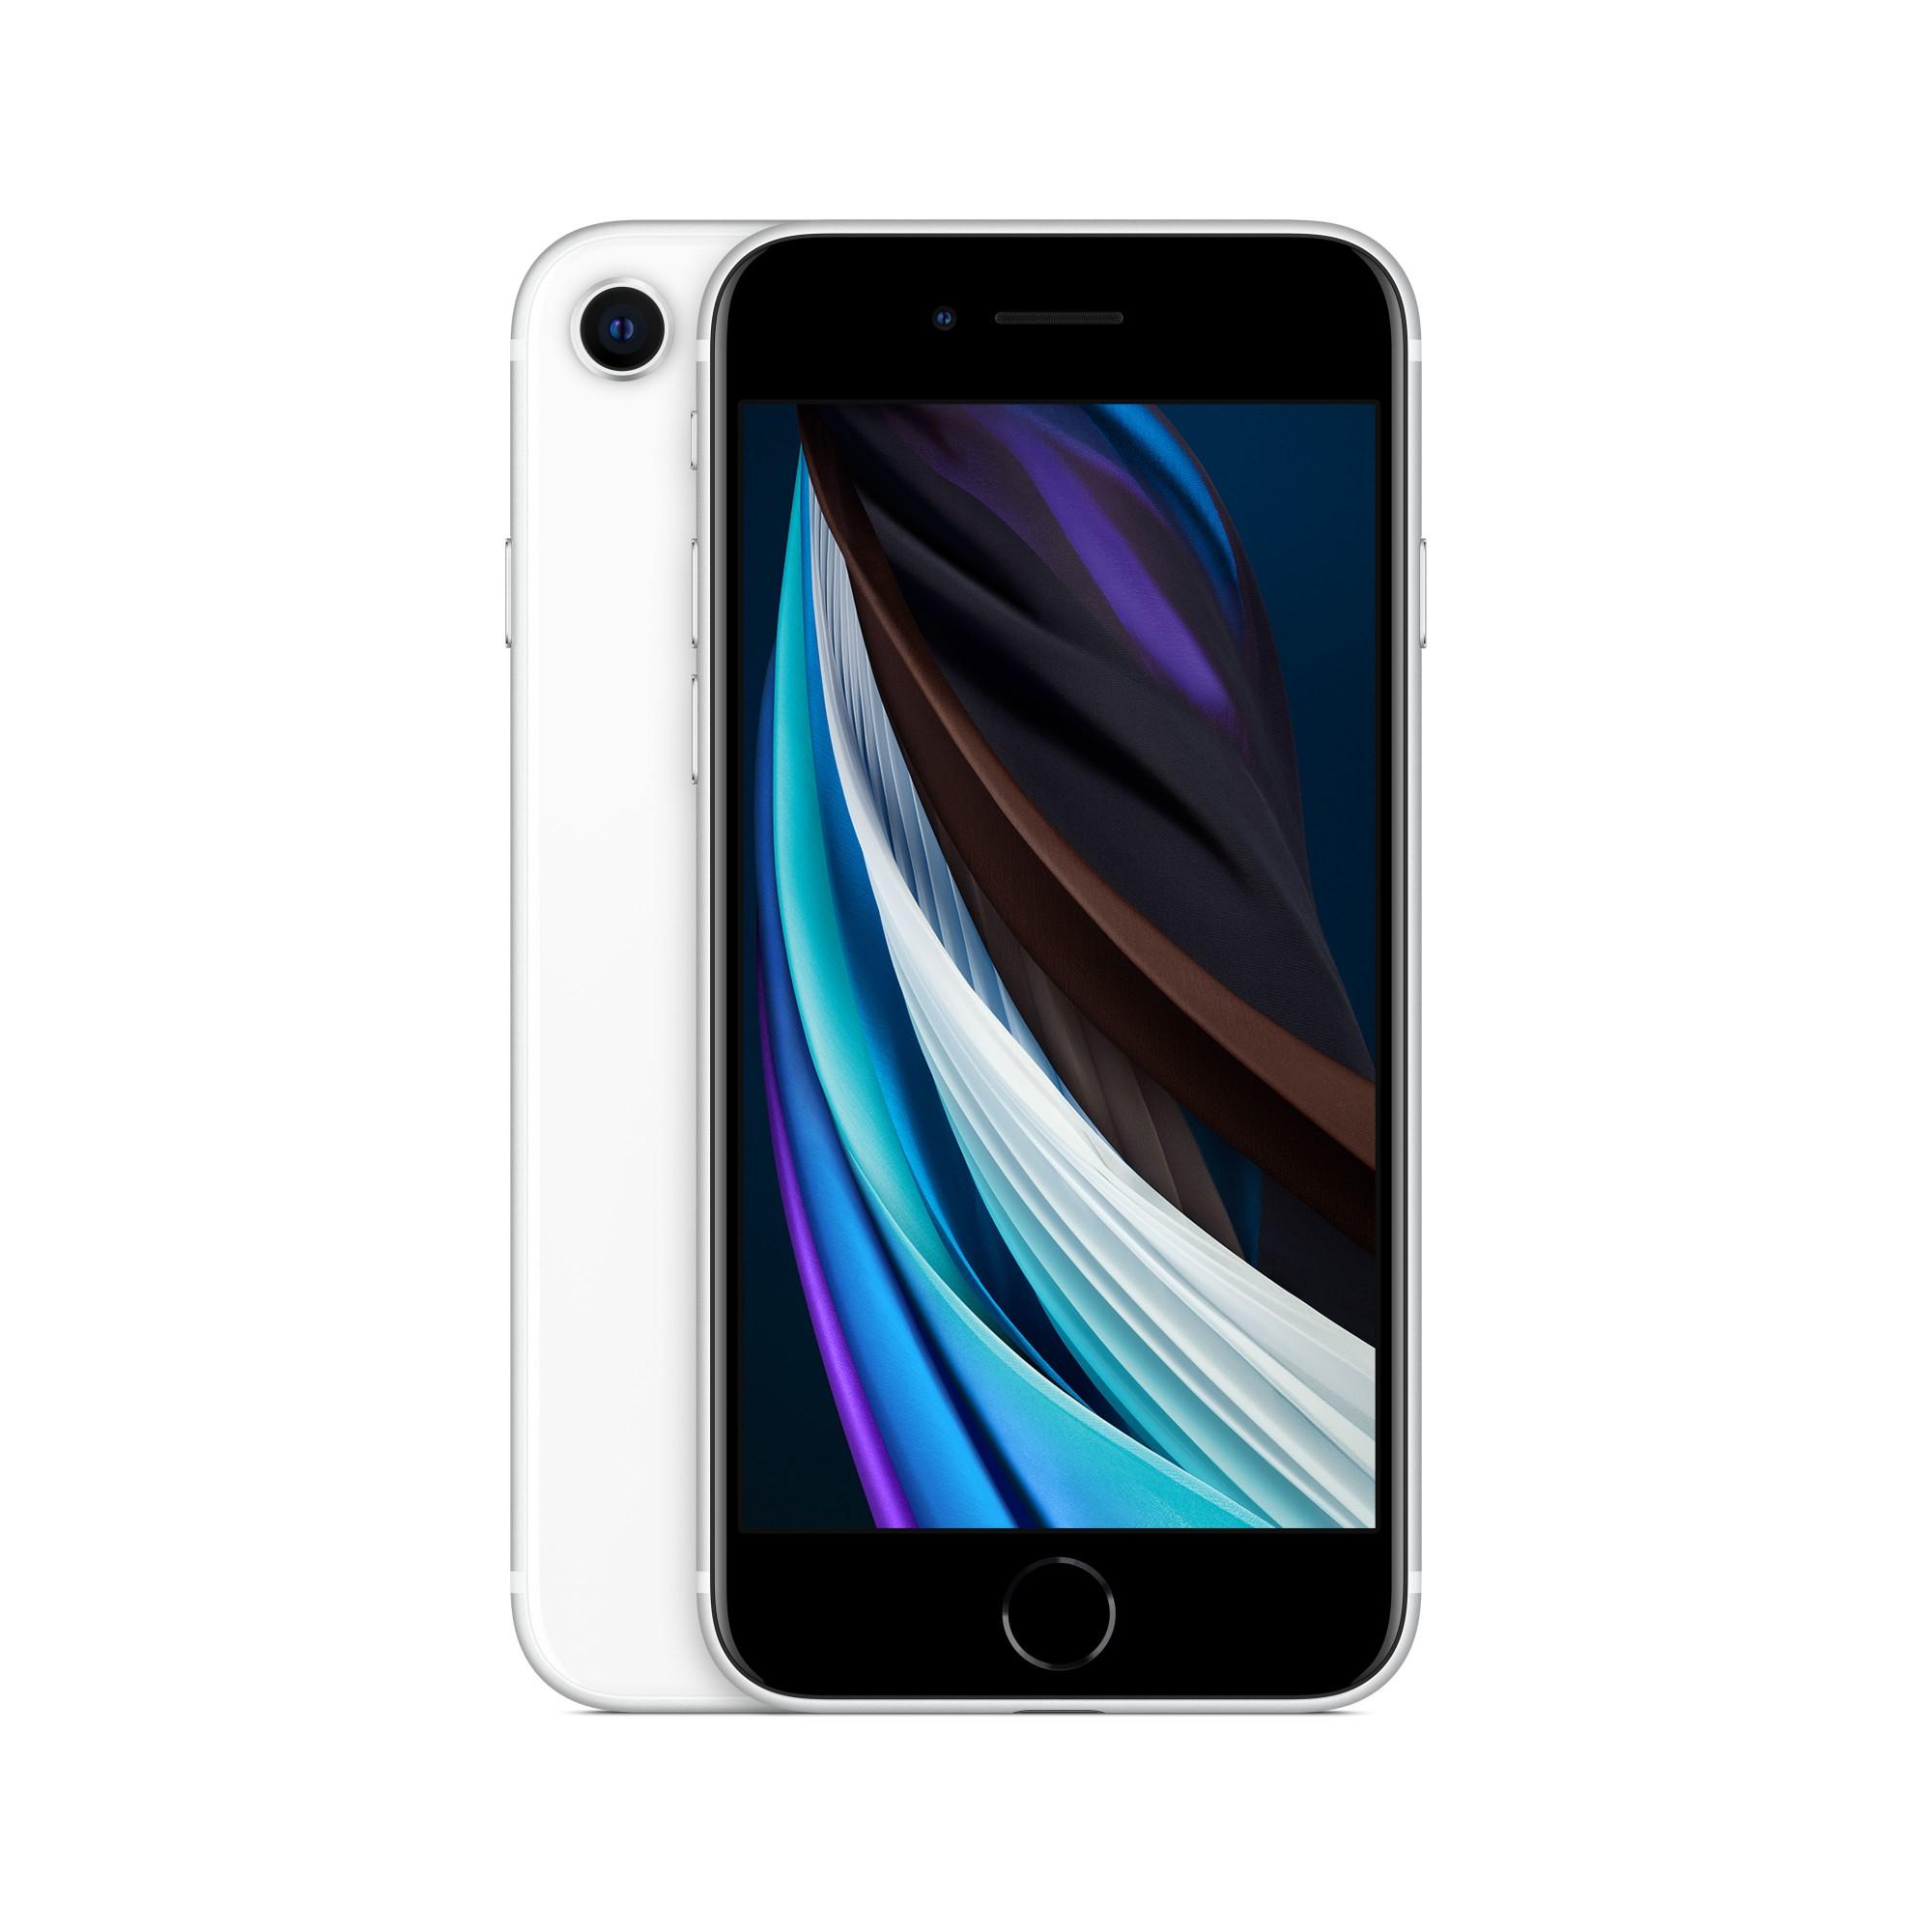 "Apple iPhone SE 11.9 cm (4.7"") 64 GB Hybrid Dual SIM 4G White iOS 14"